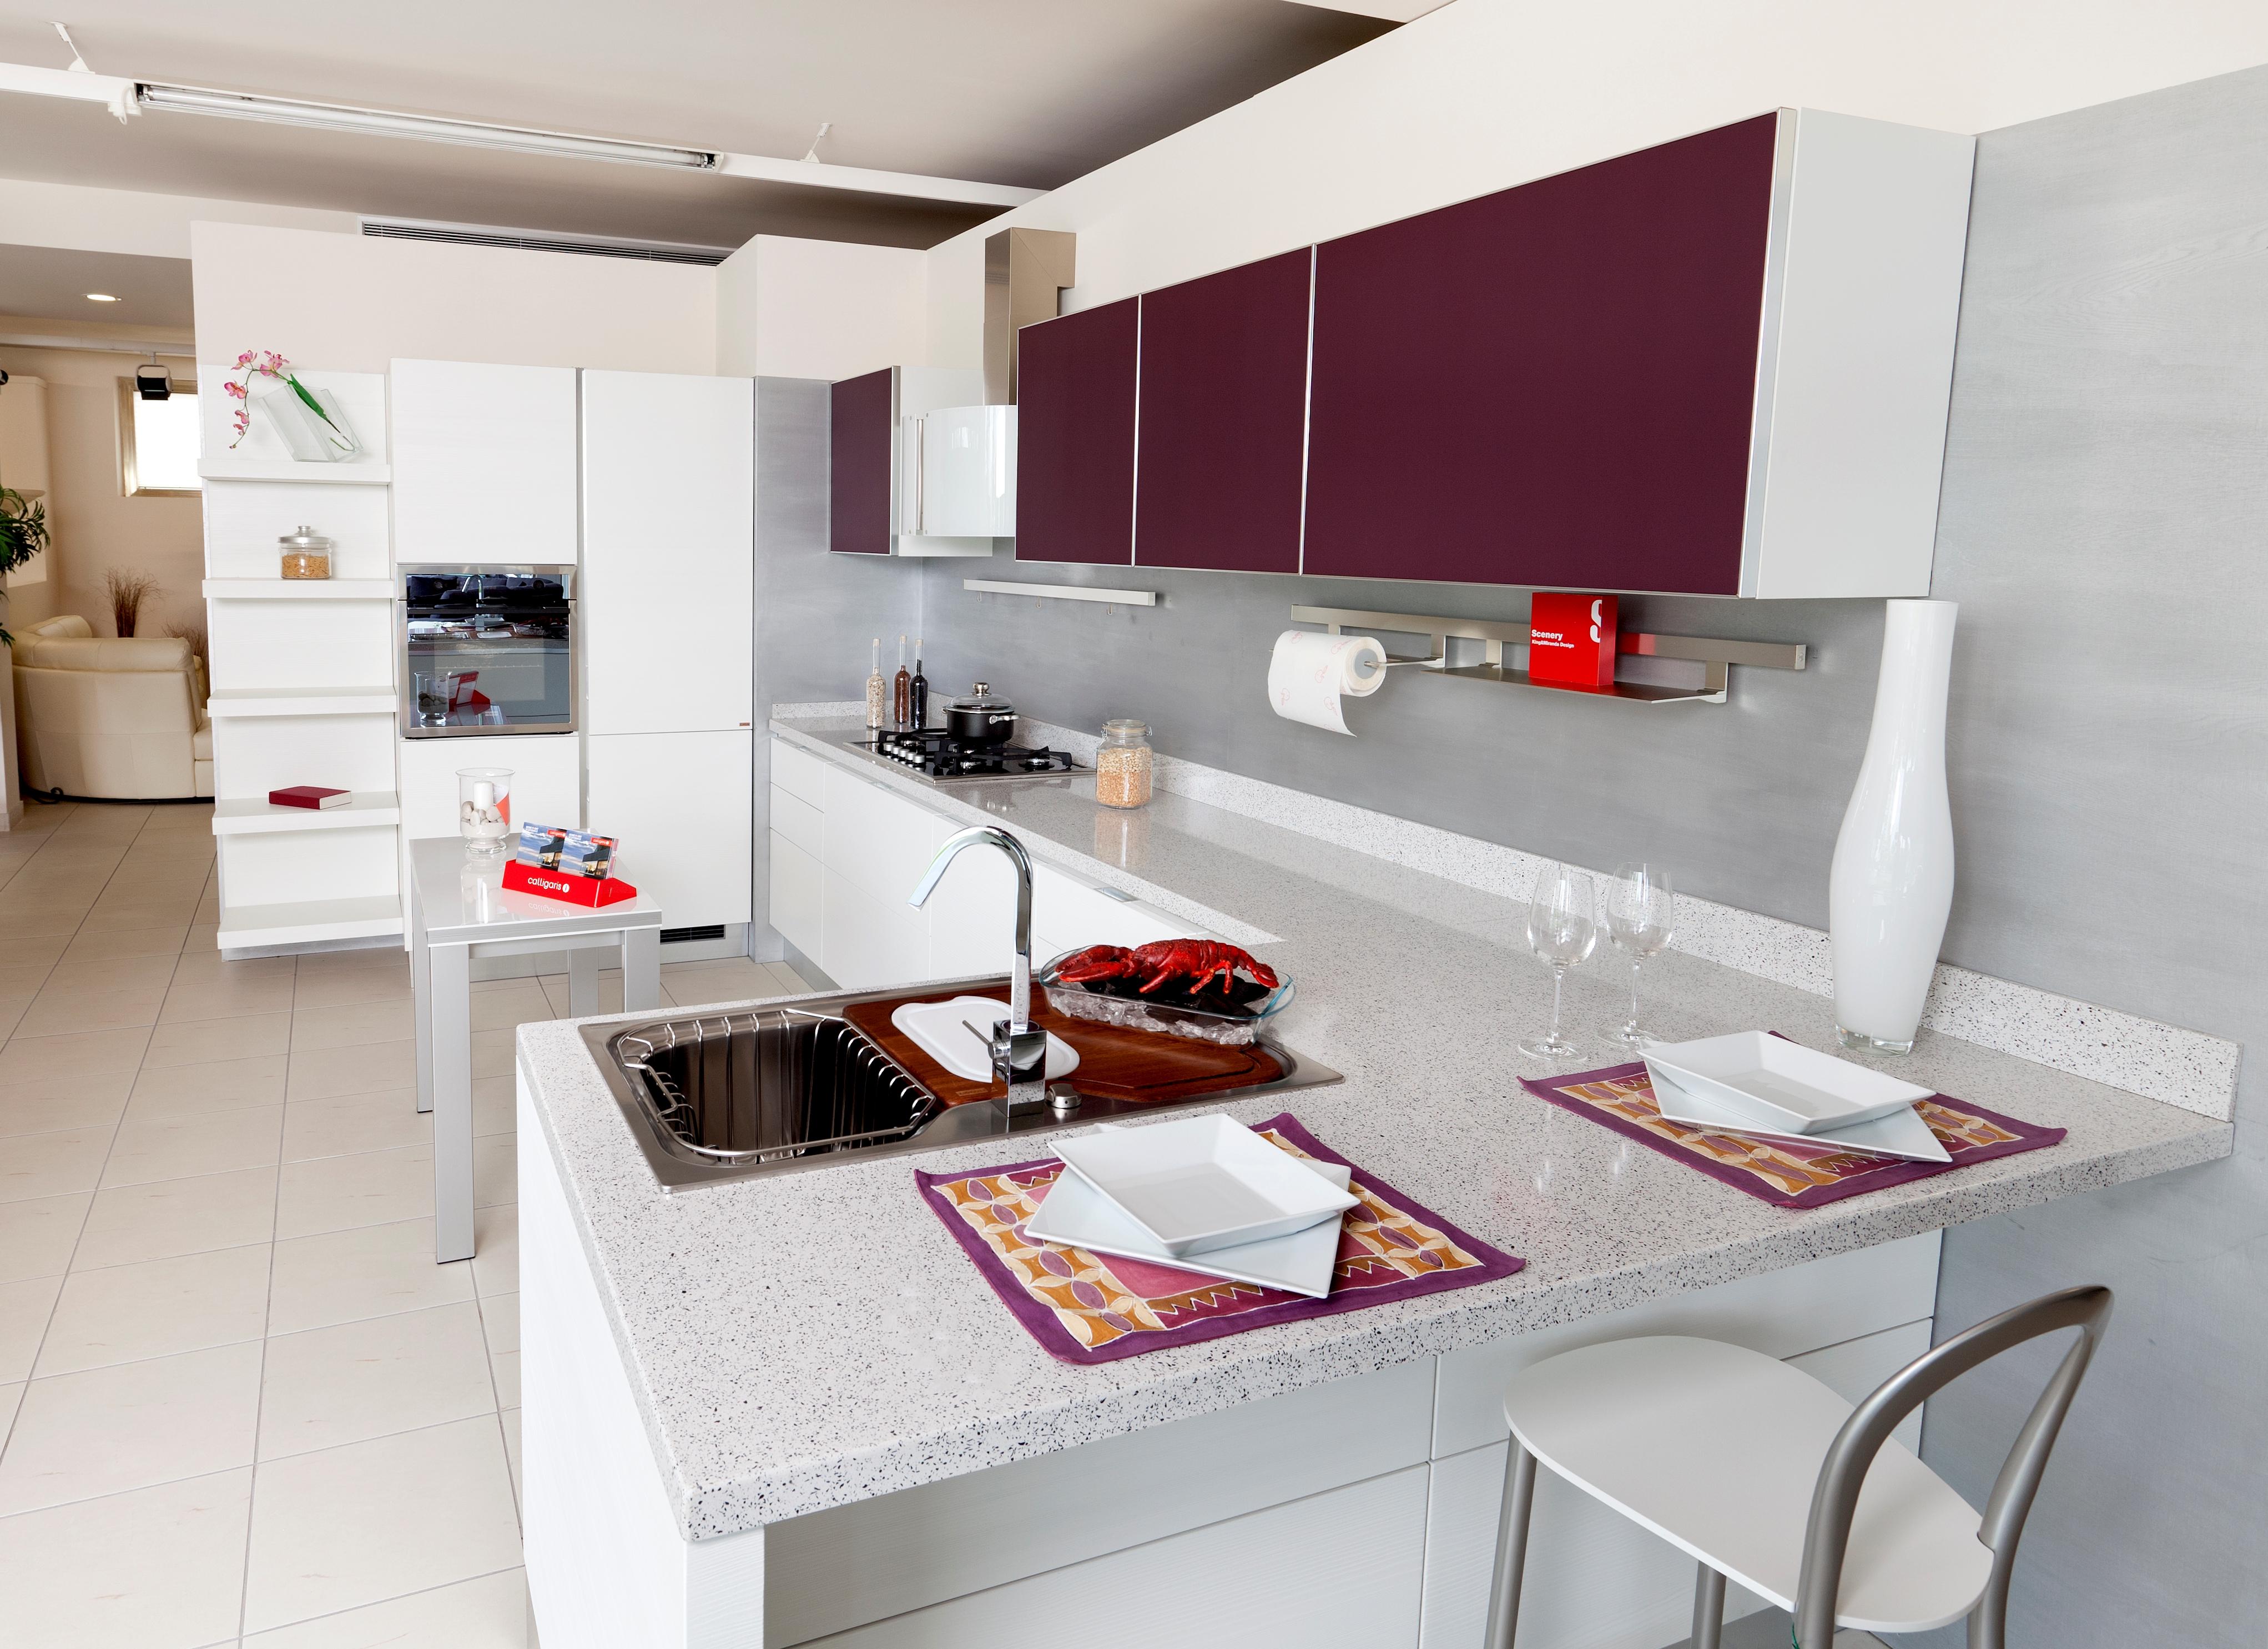 Awesome Veneta Cucine O Scavolini Pictures - Ideas & Design 2017 ...